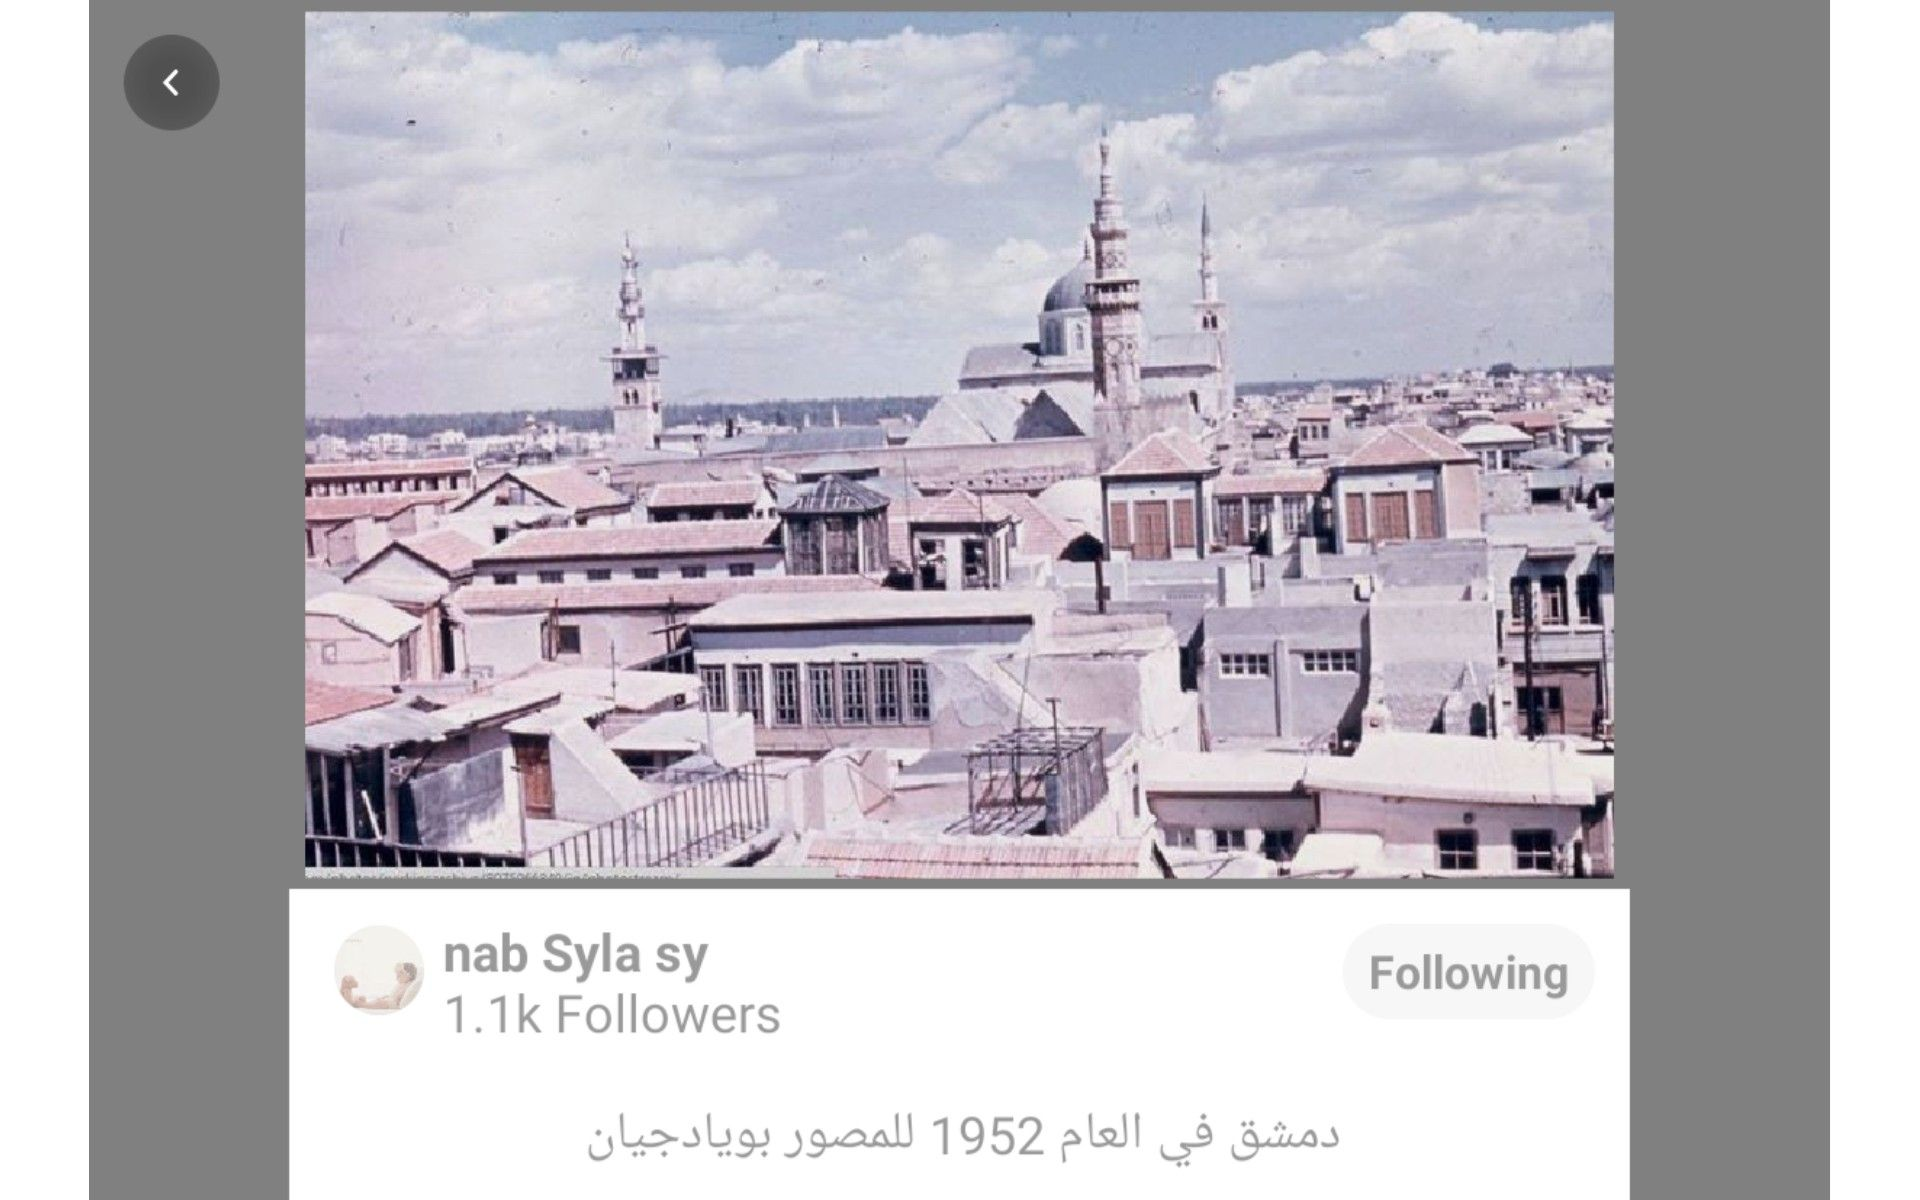 Pin By Dean F On Damascus Old City Paris Skyline Skyline Old City